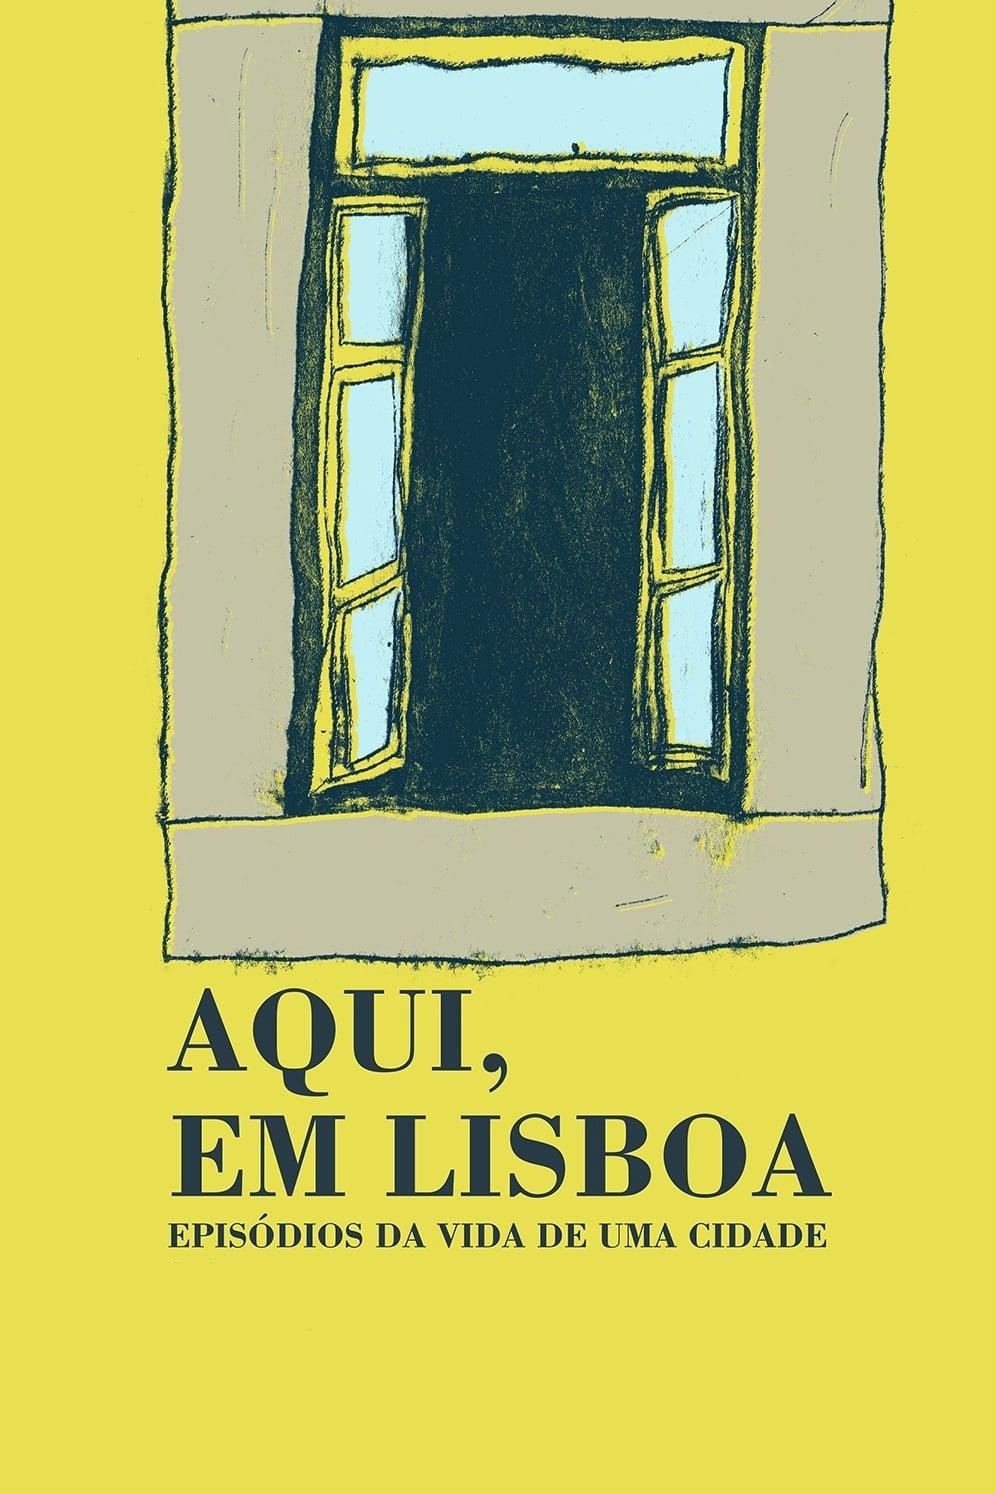 Here in Lisbon